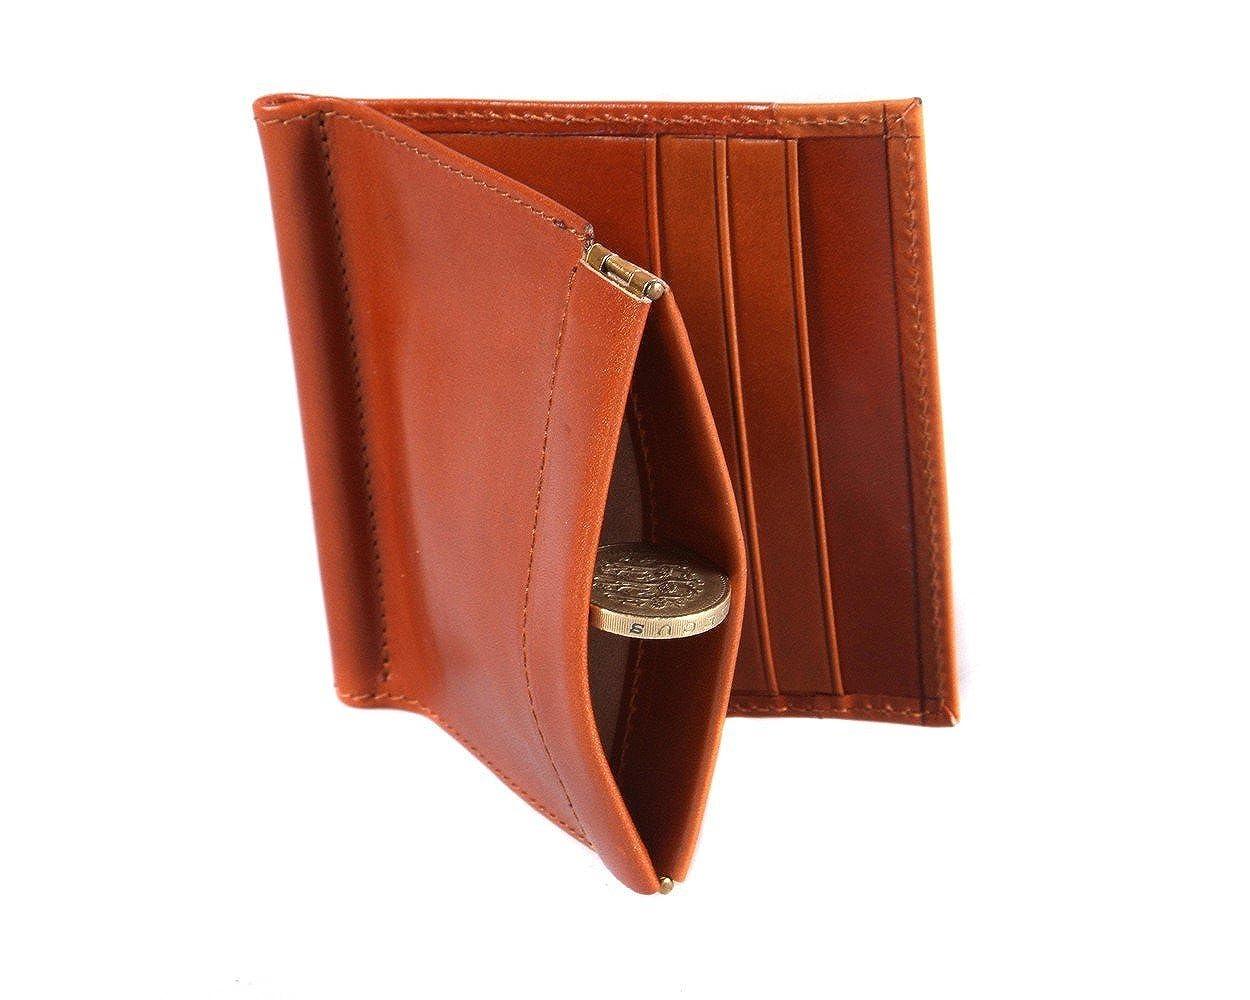 SAGEBROWN Ultimate Compact Wallet